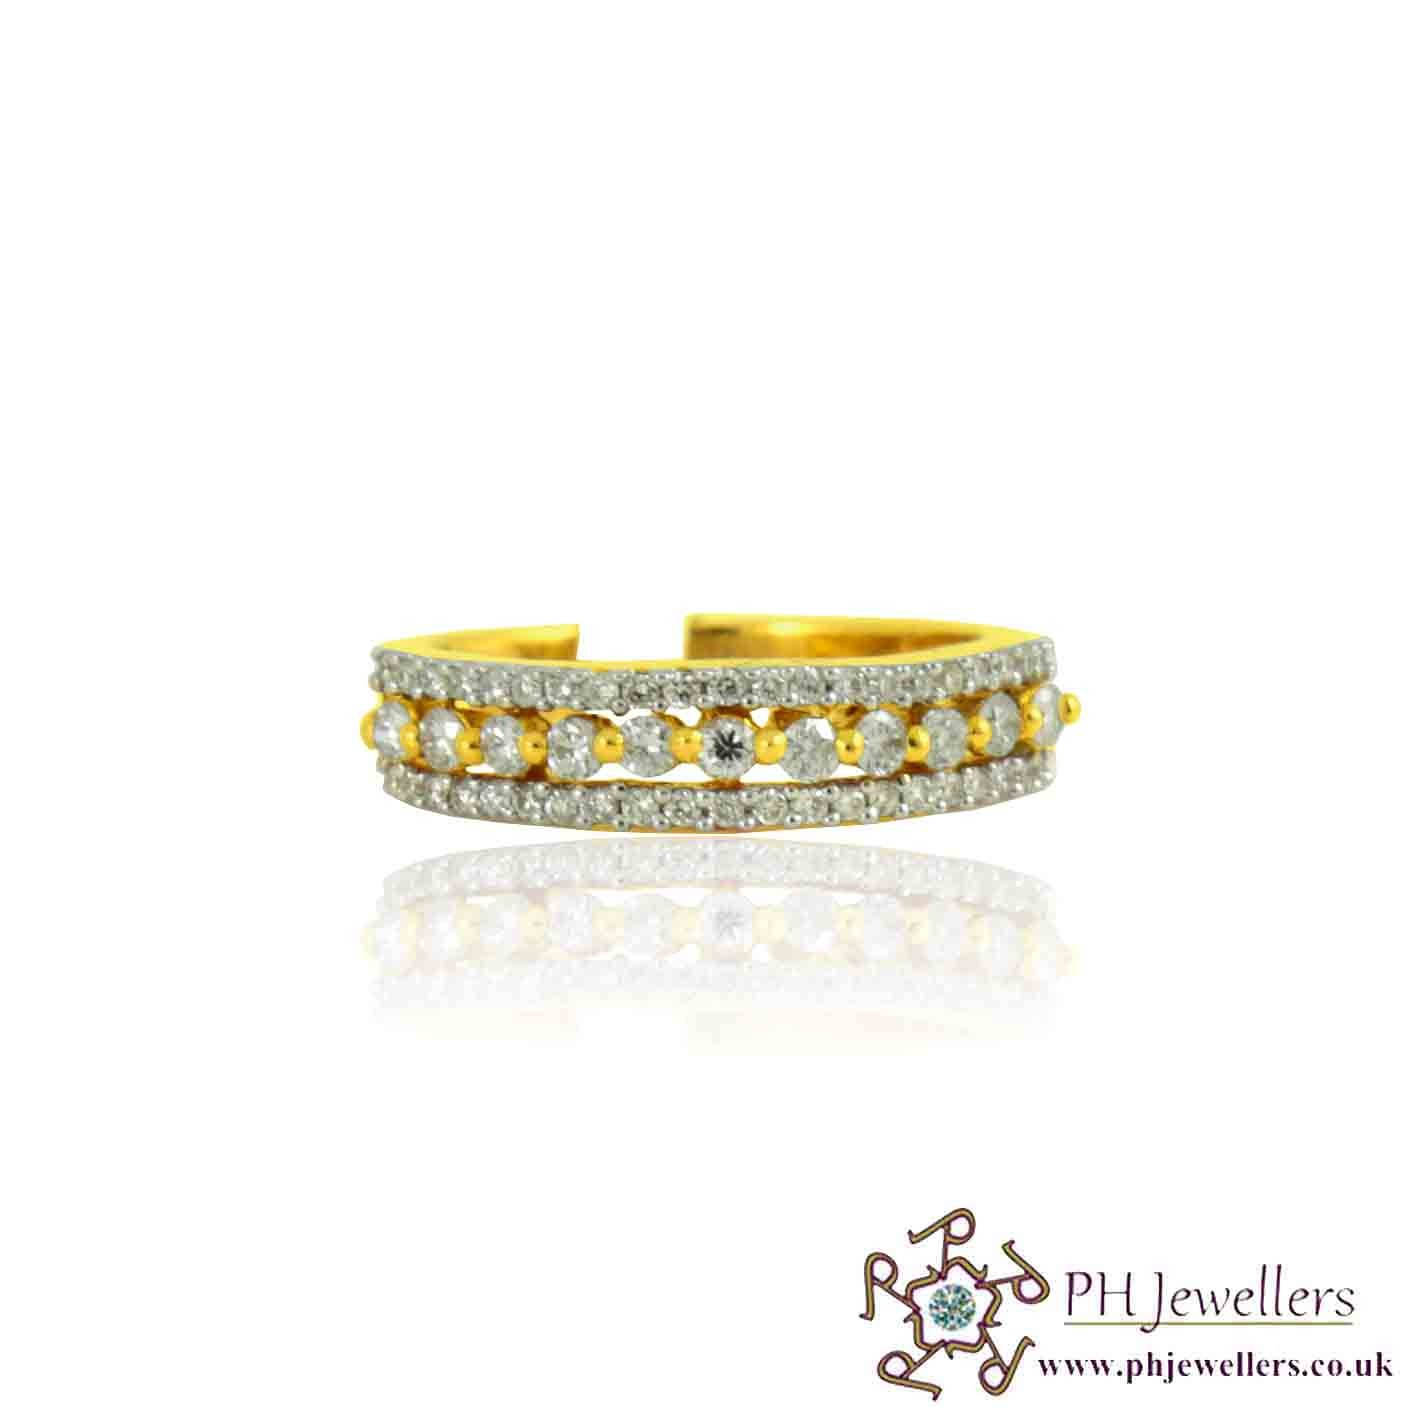 18CT 750 Hallmark Yellow Gold Diamond Size M Ring DR21